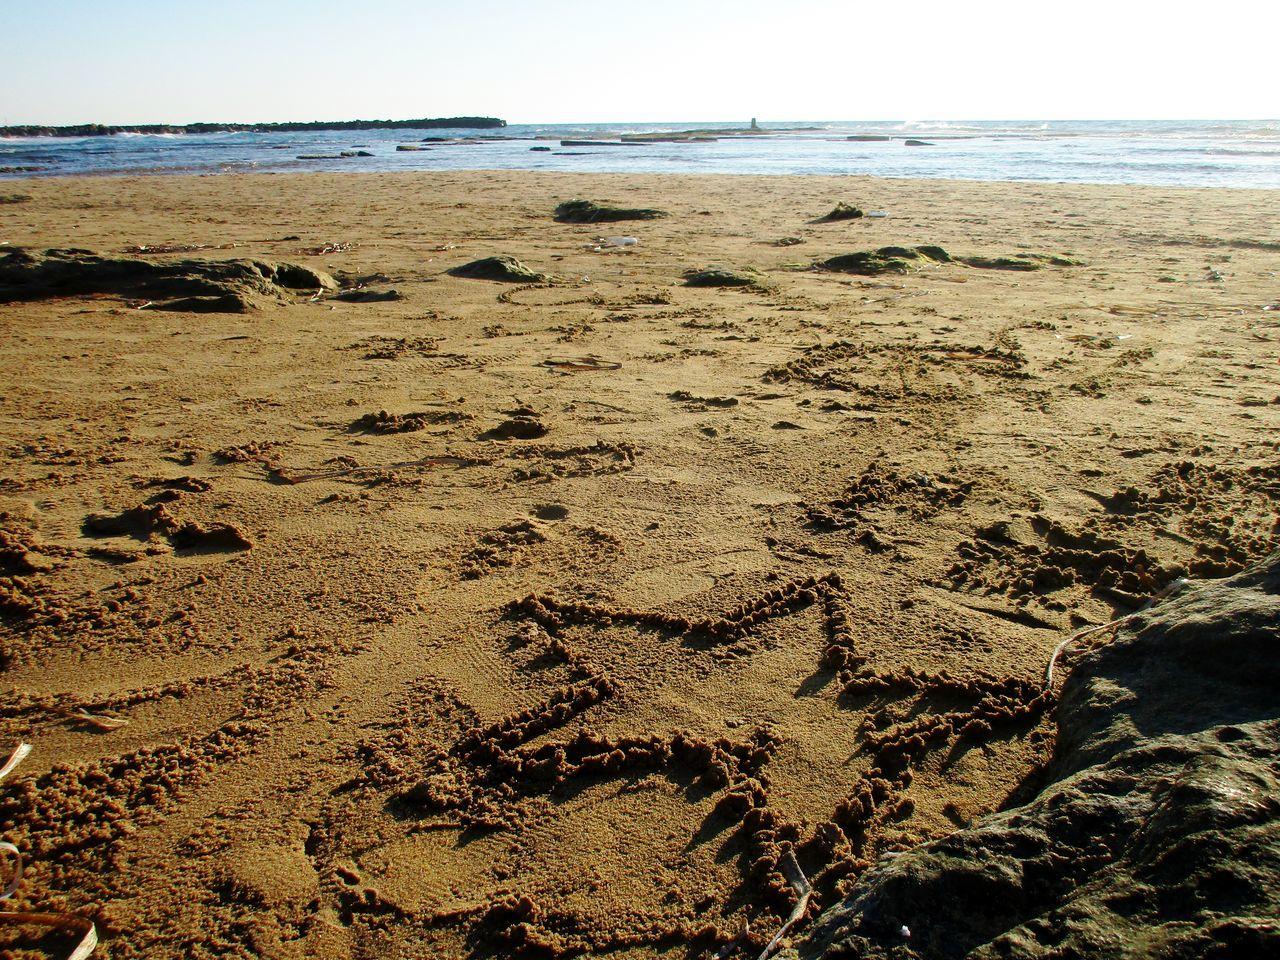 Beach Sand Sand Star Sea Sea Sand Showcase March Showcase: March Star Winter Showcase April 43 Golden Moments